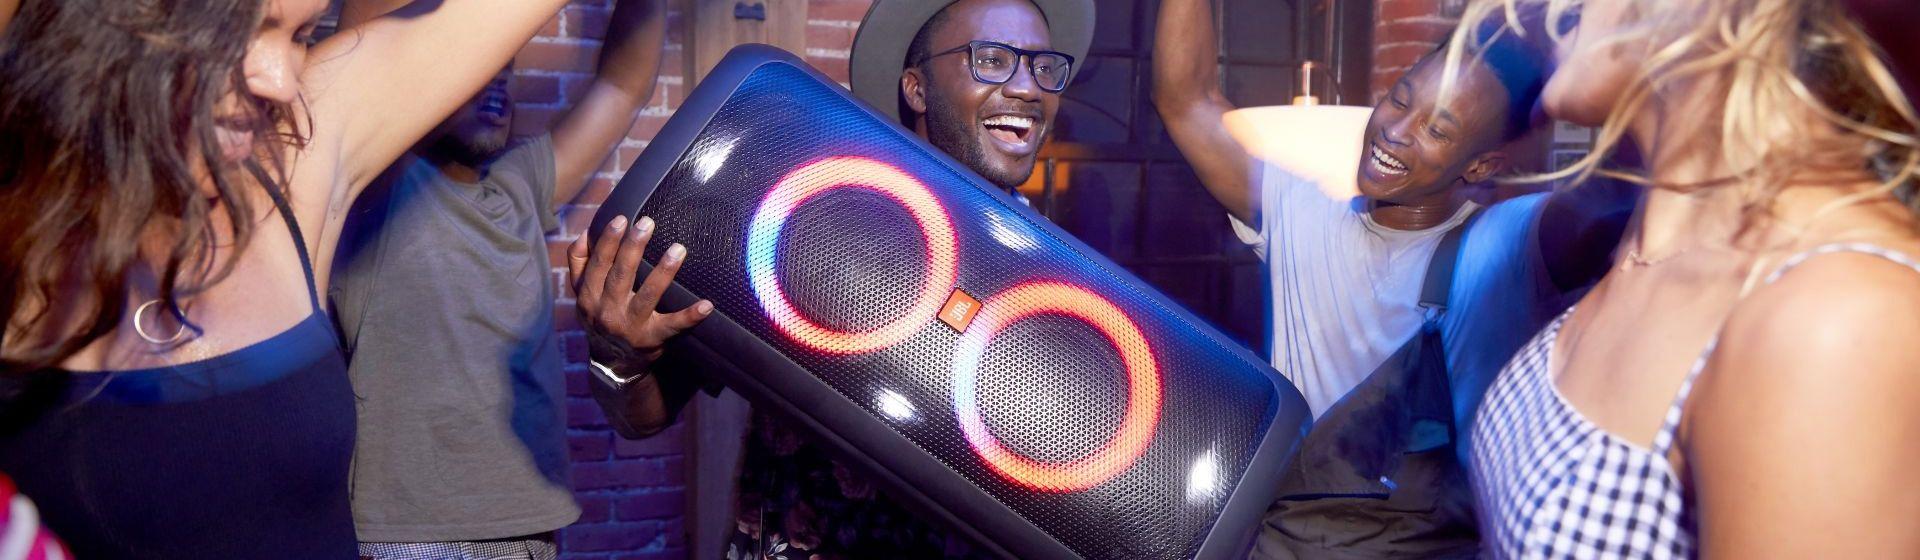 JBL PartyBox 300: veja a análise de ficha técnica da caixa de som